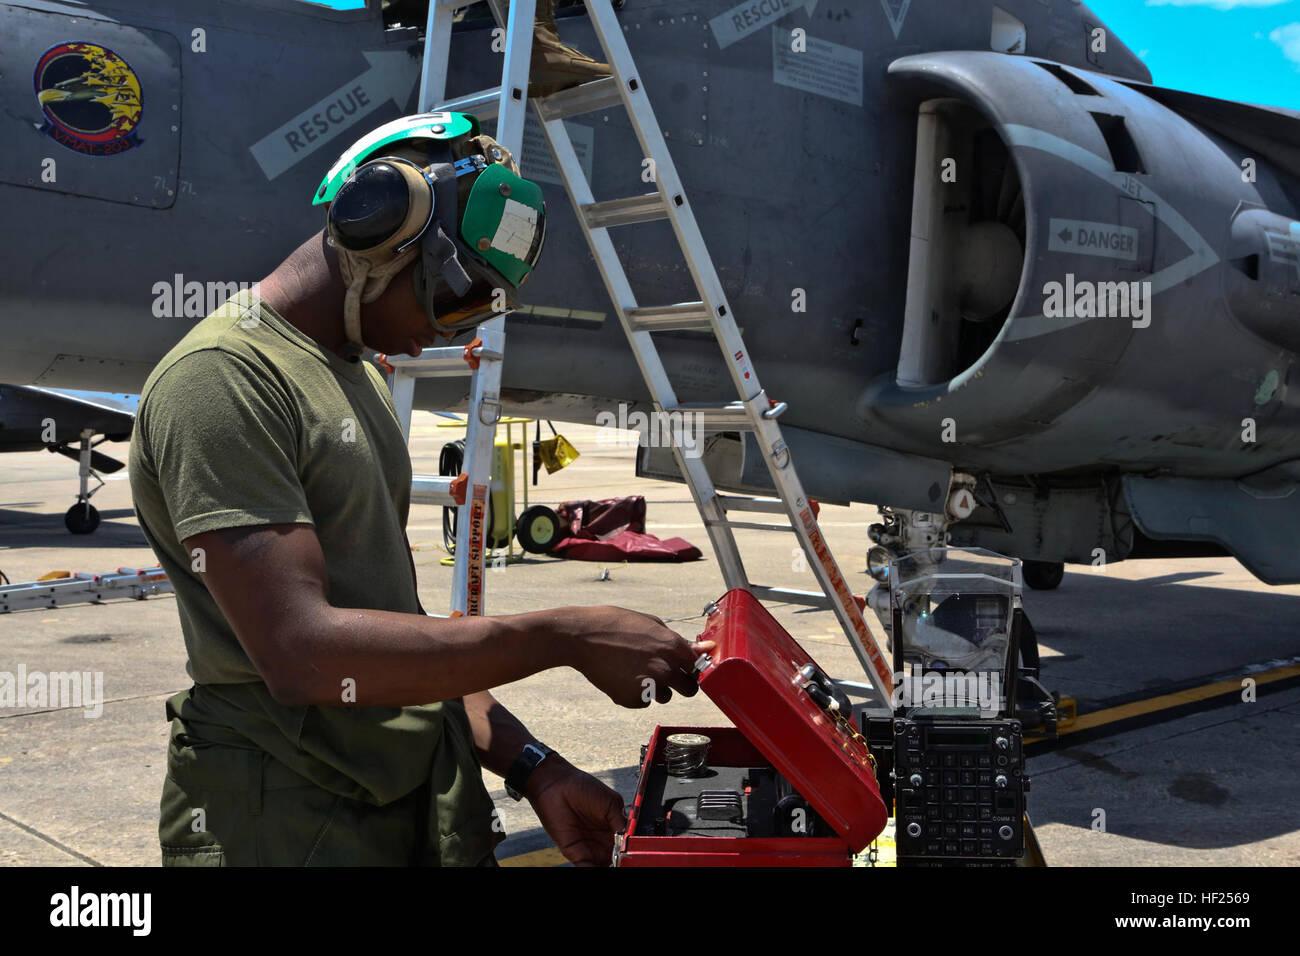 avionic technician